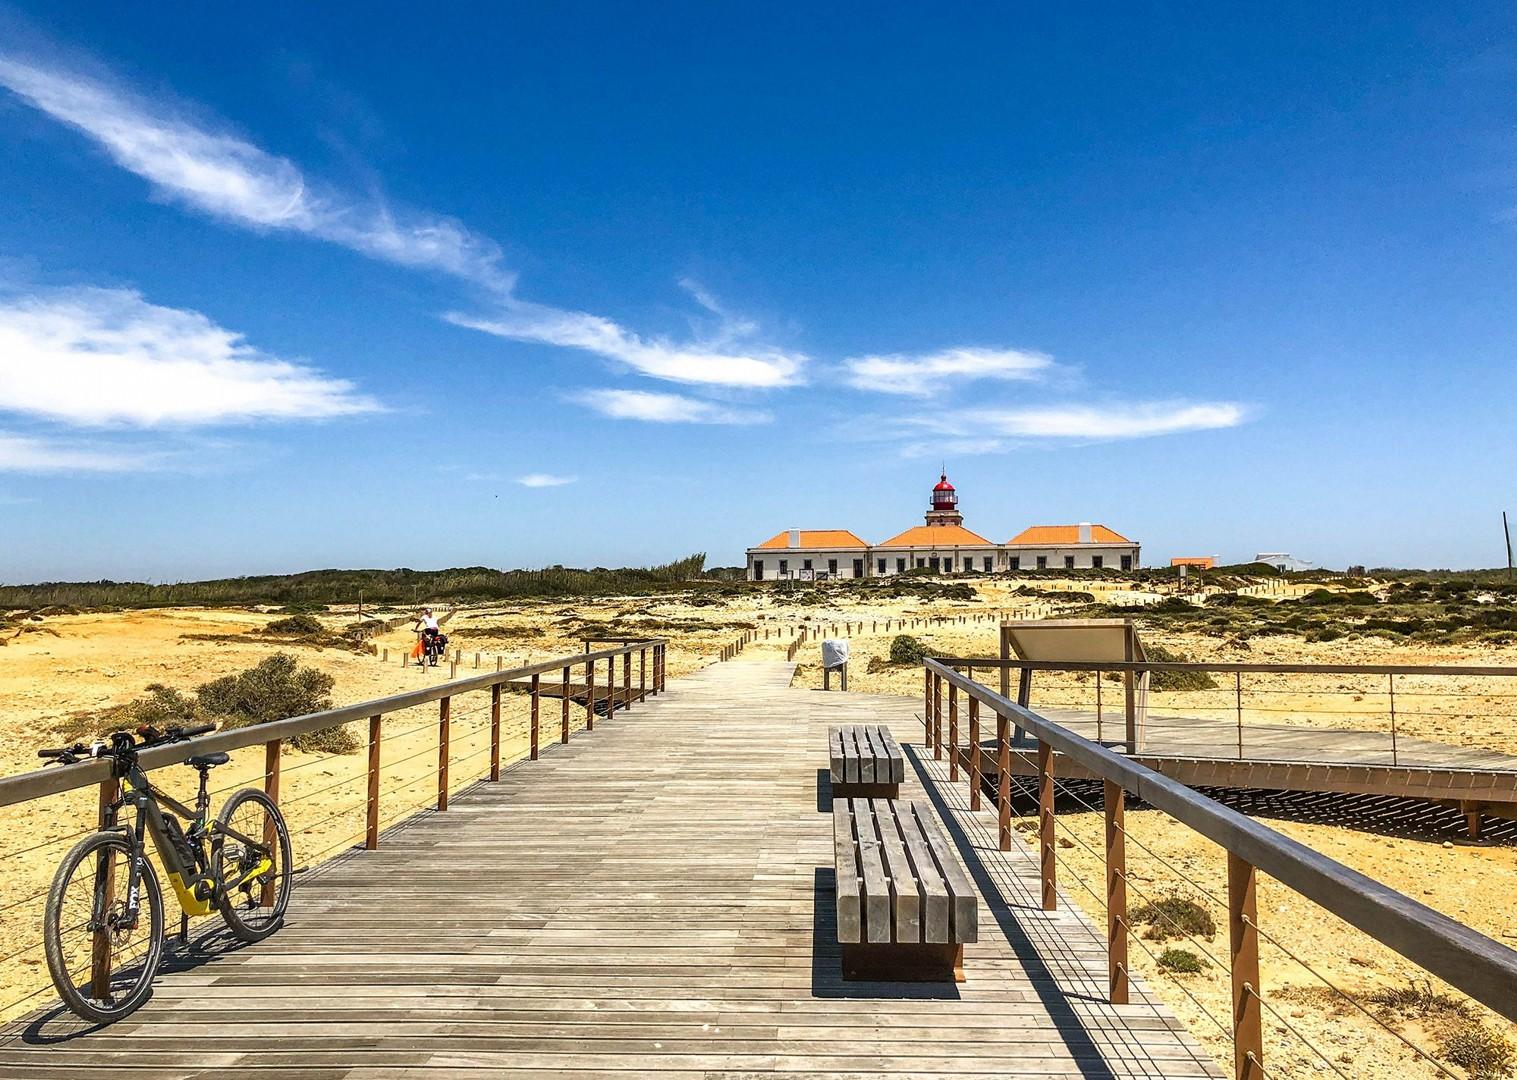 cycling-portugal-leisure-self-guided-holiday-coastal-explorer-bike.jpg - Portugal - Alentejo and Algarve Coastal Explorer - Self-Guided Leisure Cycling Holiday - Leisure Cycling